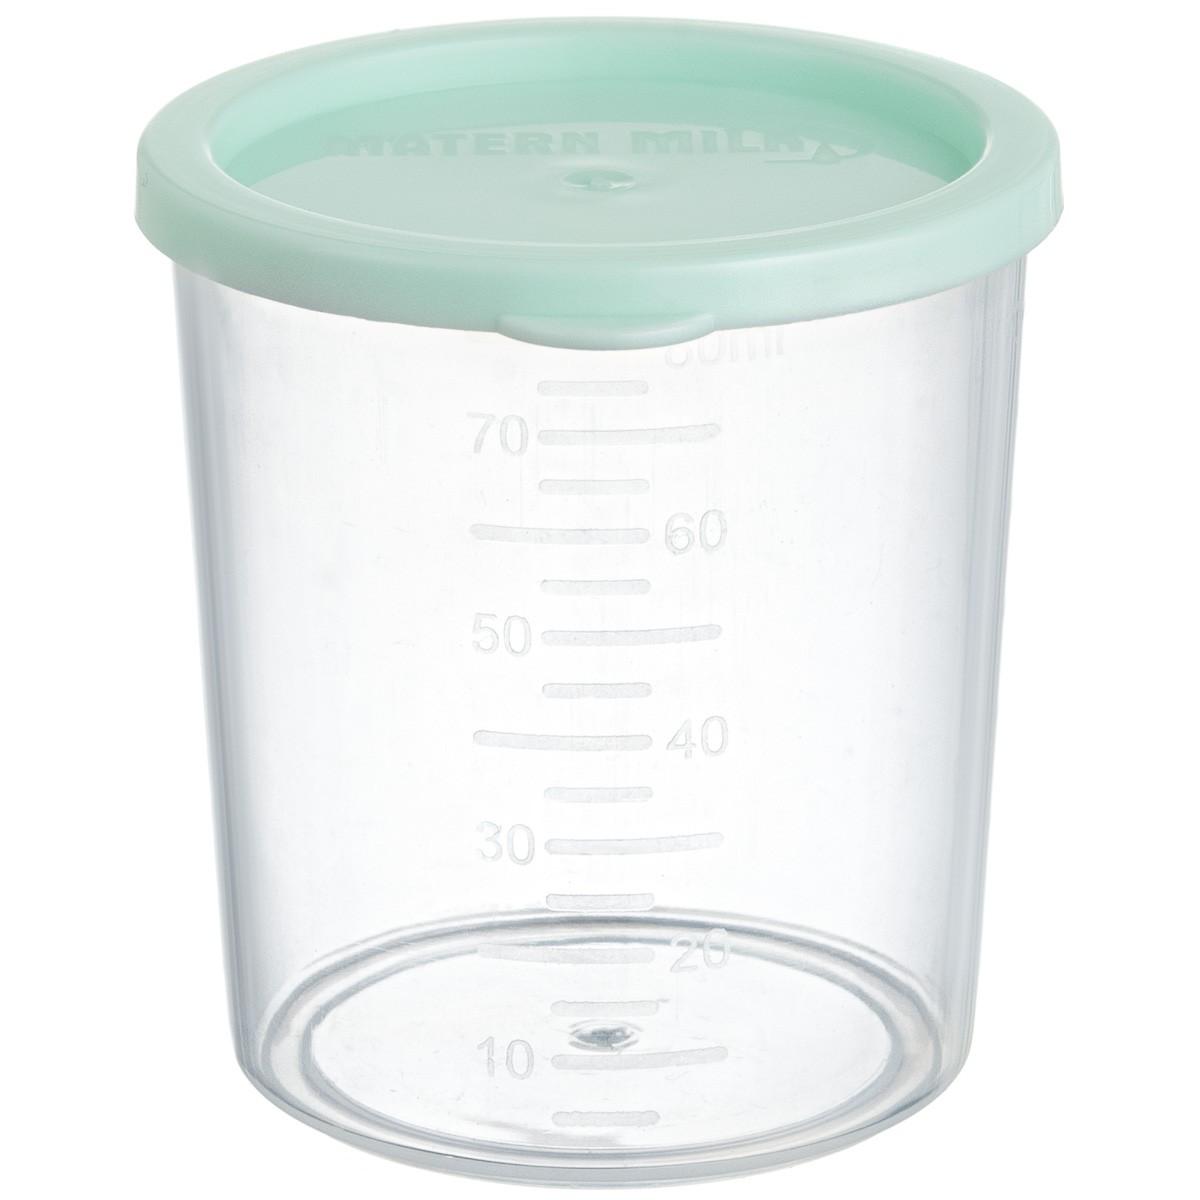 kit 500  Copos Para Armazenamento de Leite Materno - 80 ml  (a granel)  - Matern Milk